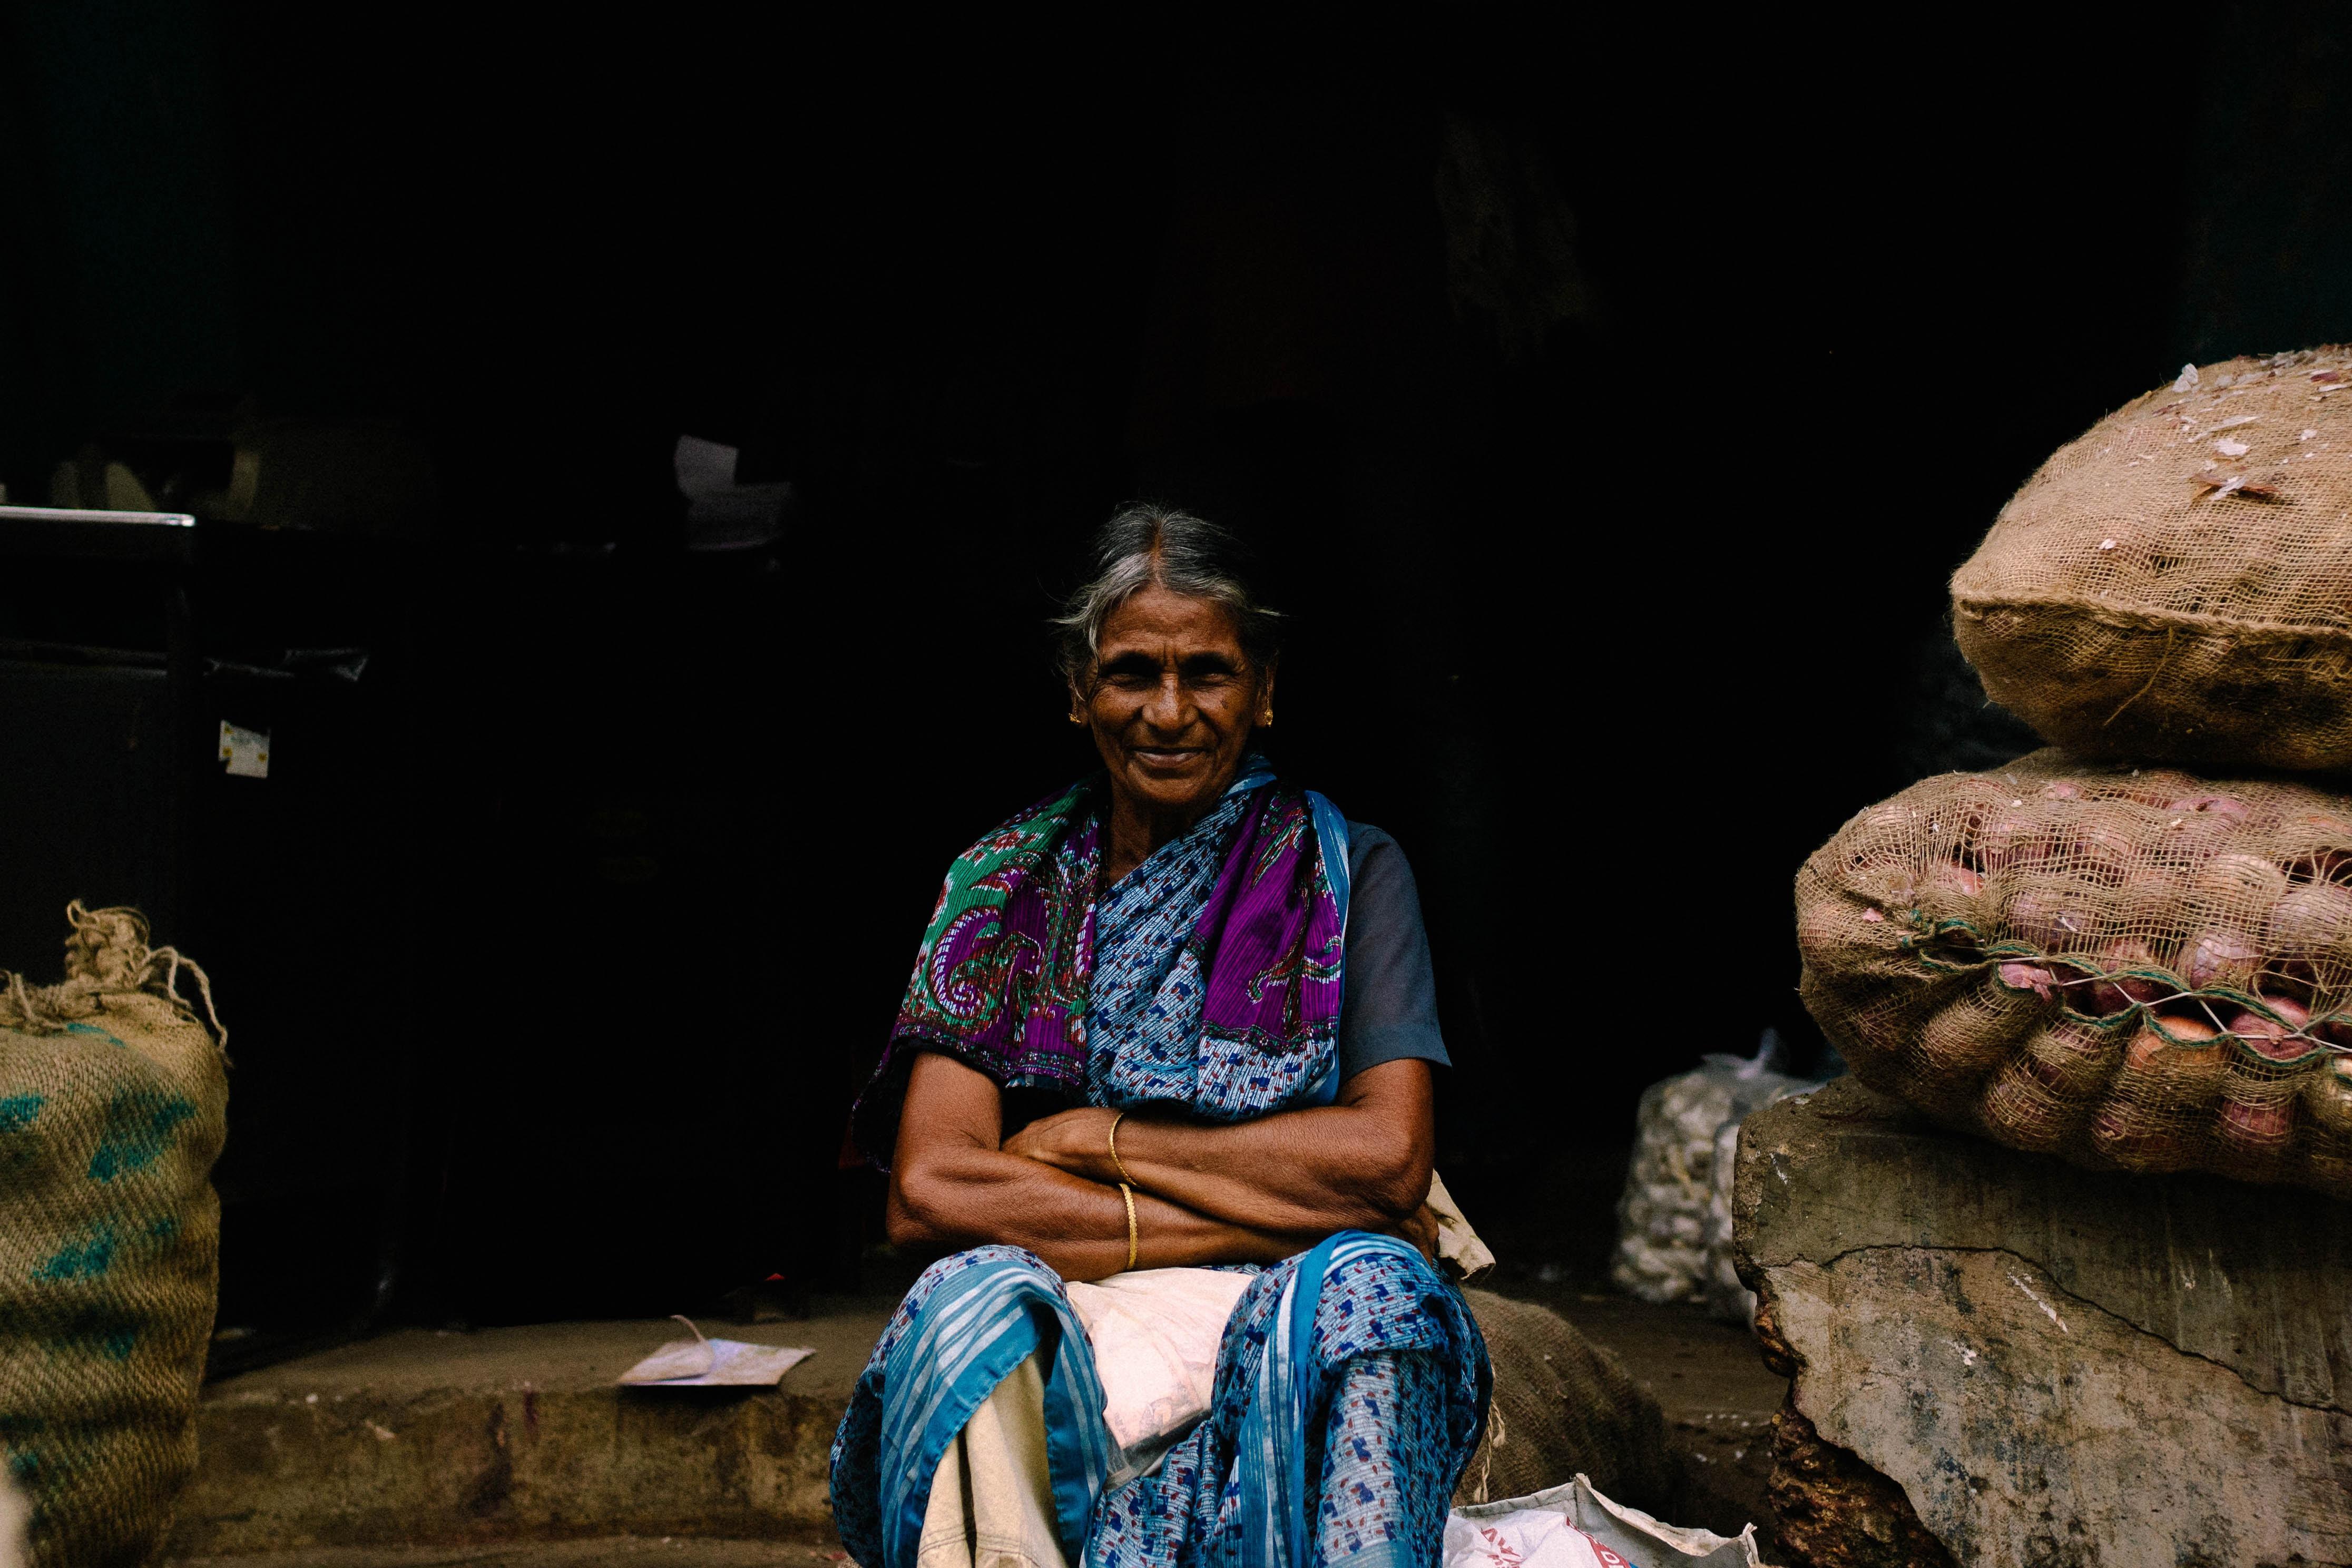 woman sitting near brown sacks